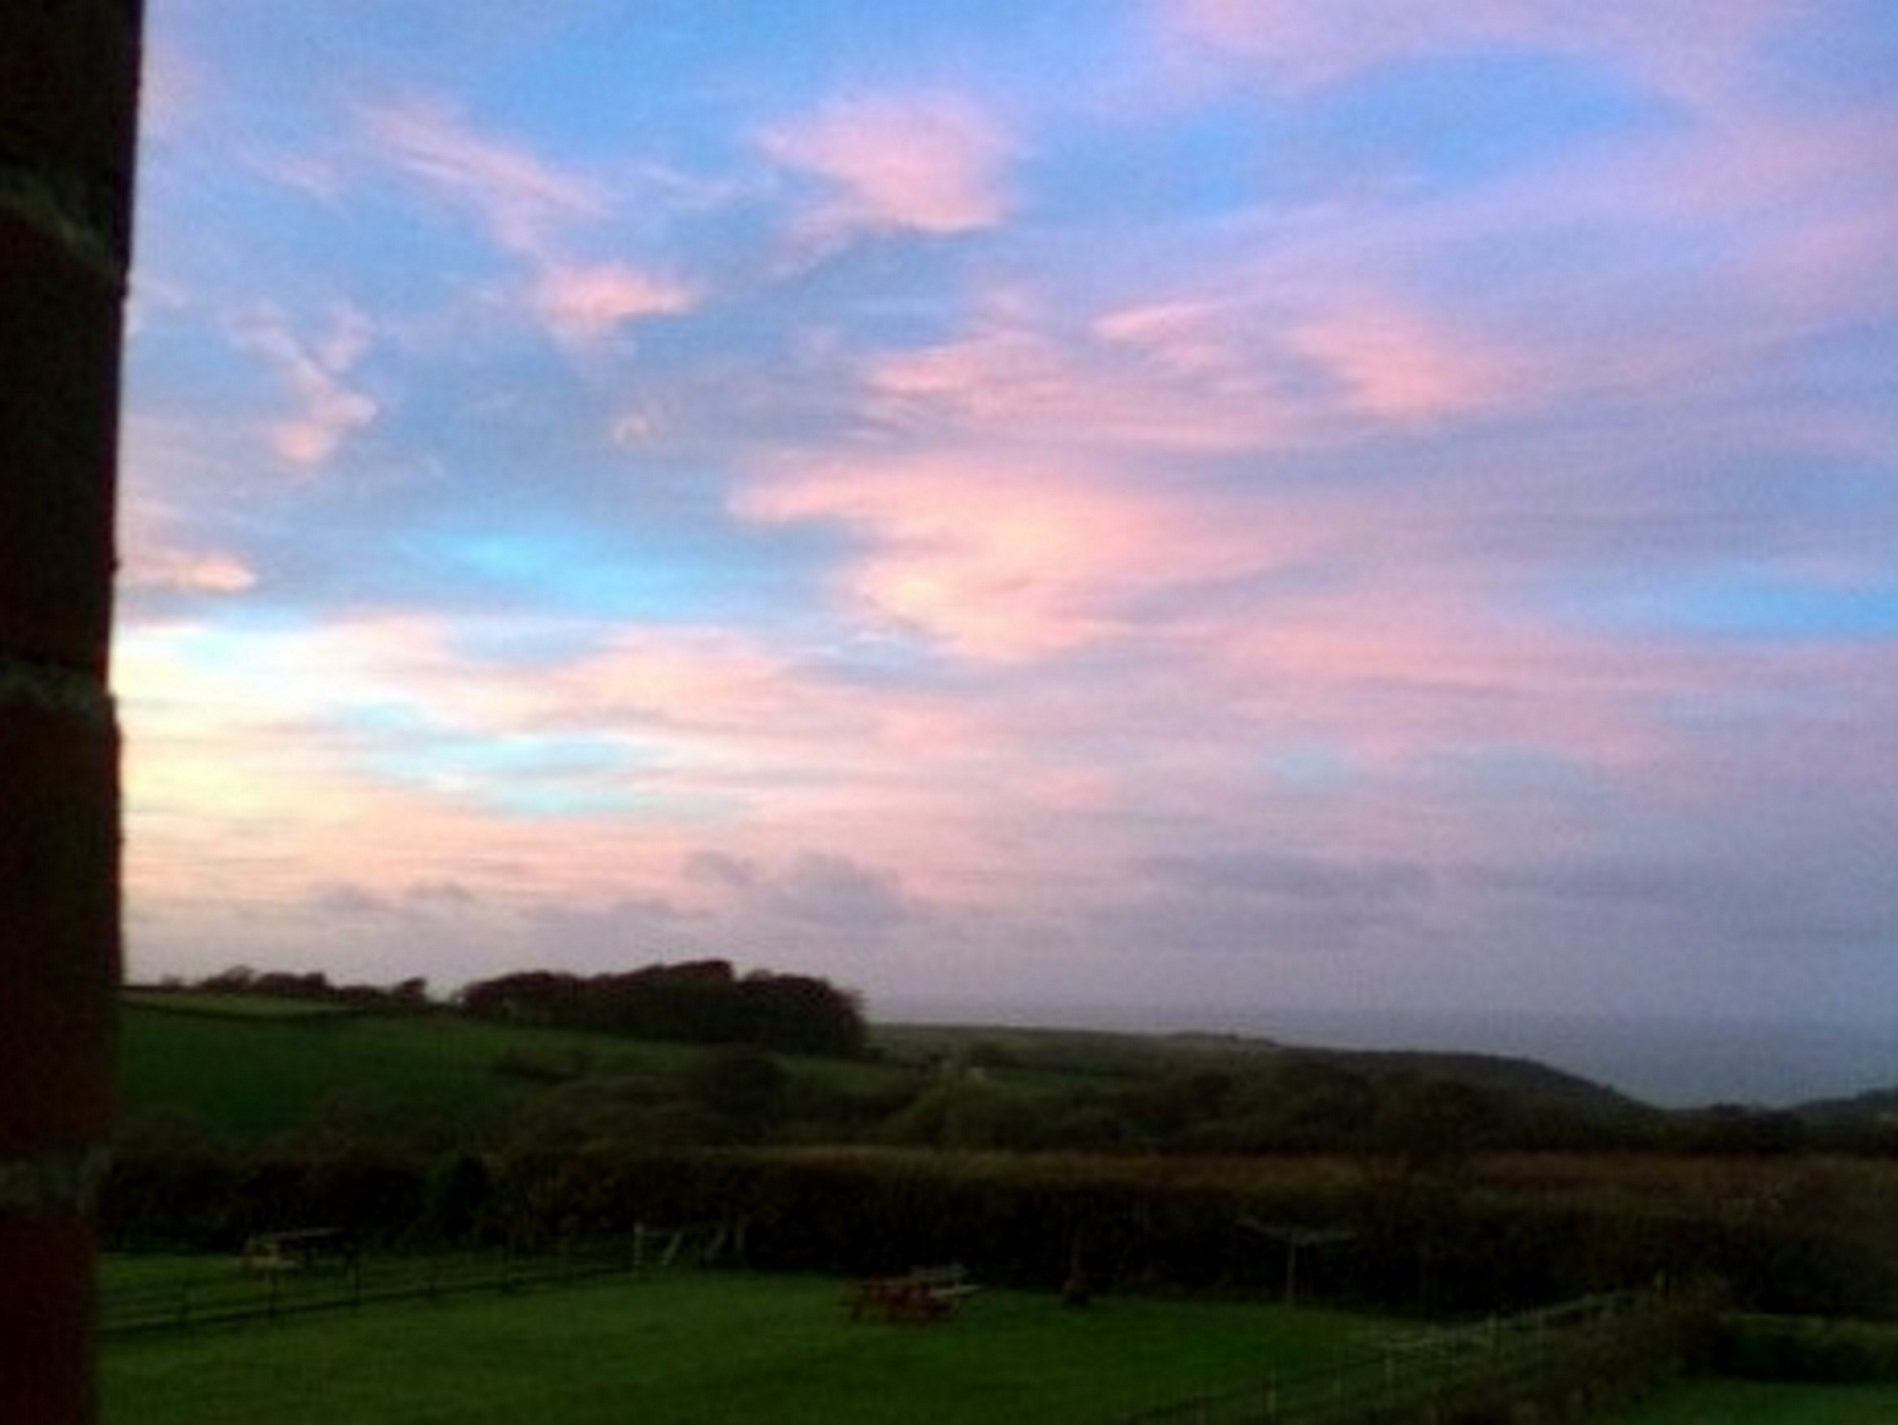 Stunning sunset over the garden